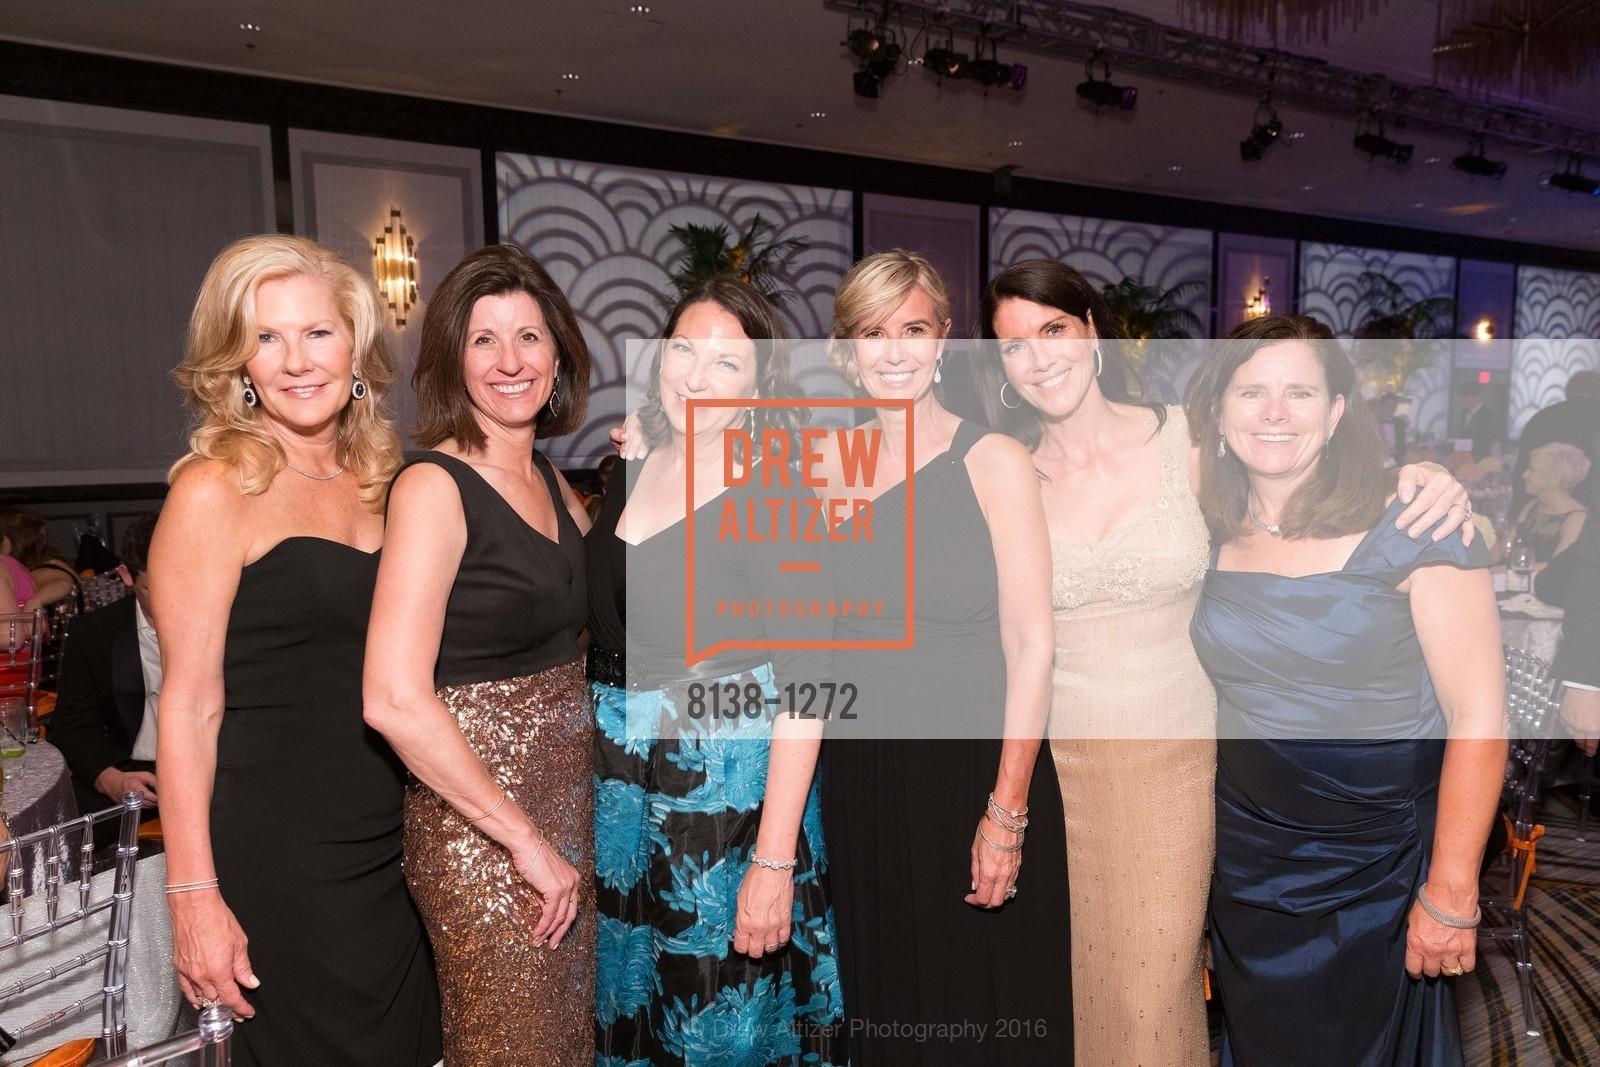 Johnna Coats, Elizabeth Canady, Amy Bick, Photo #8138-1272